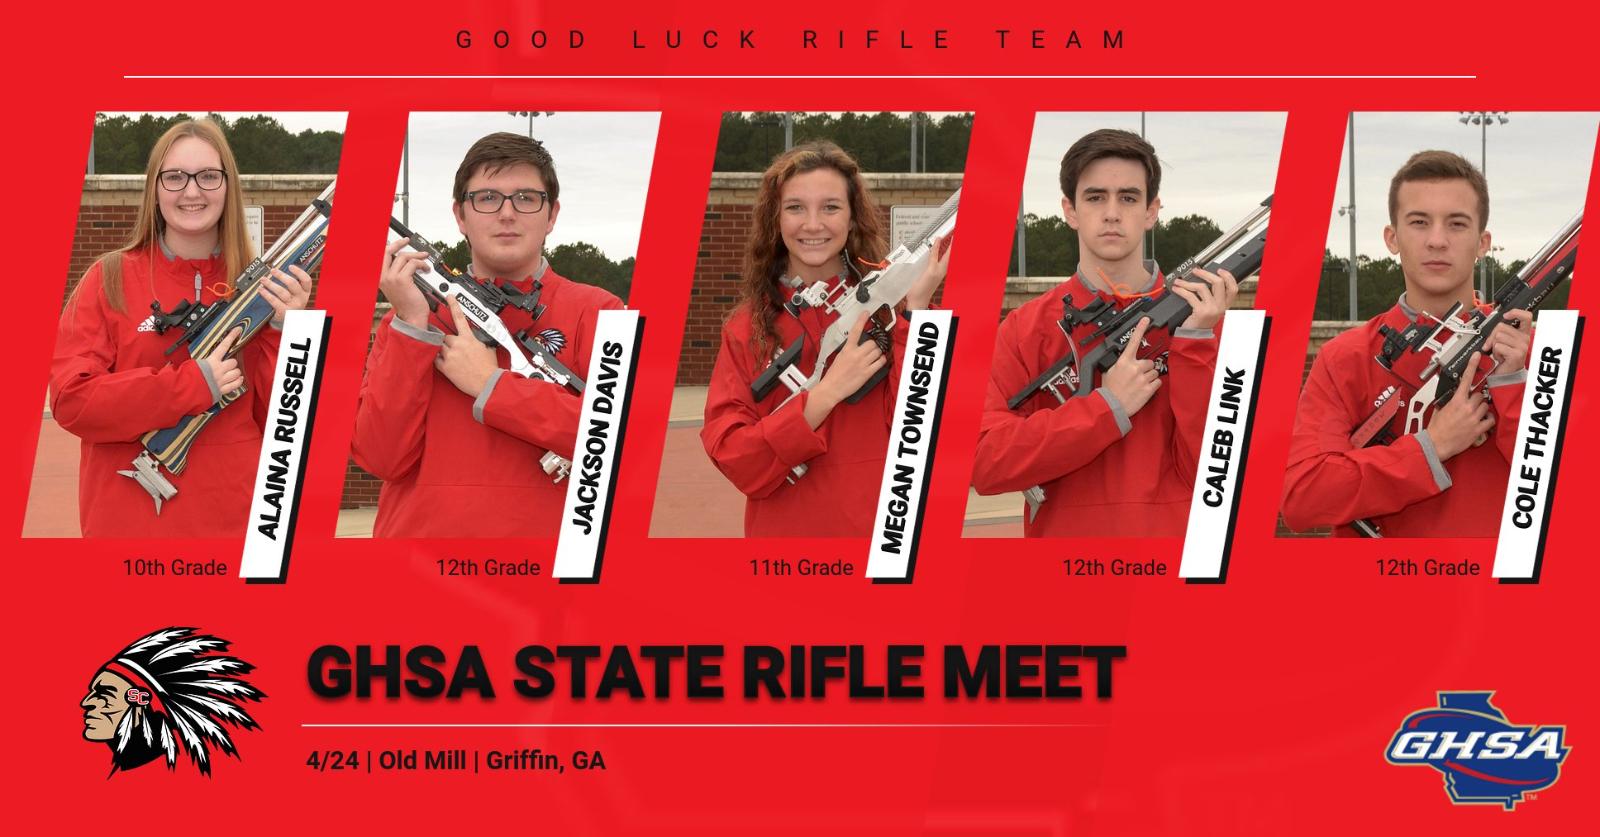 Good Luck Rifle Team @ GHSA State Meet